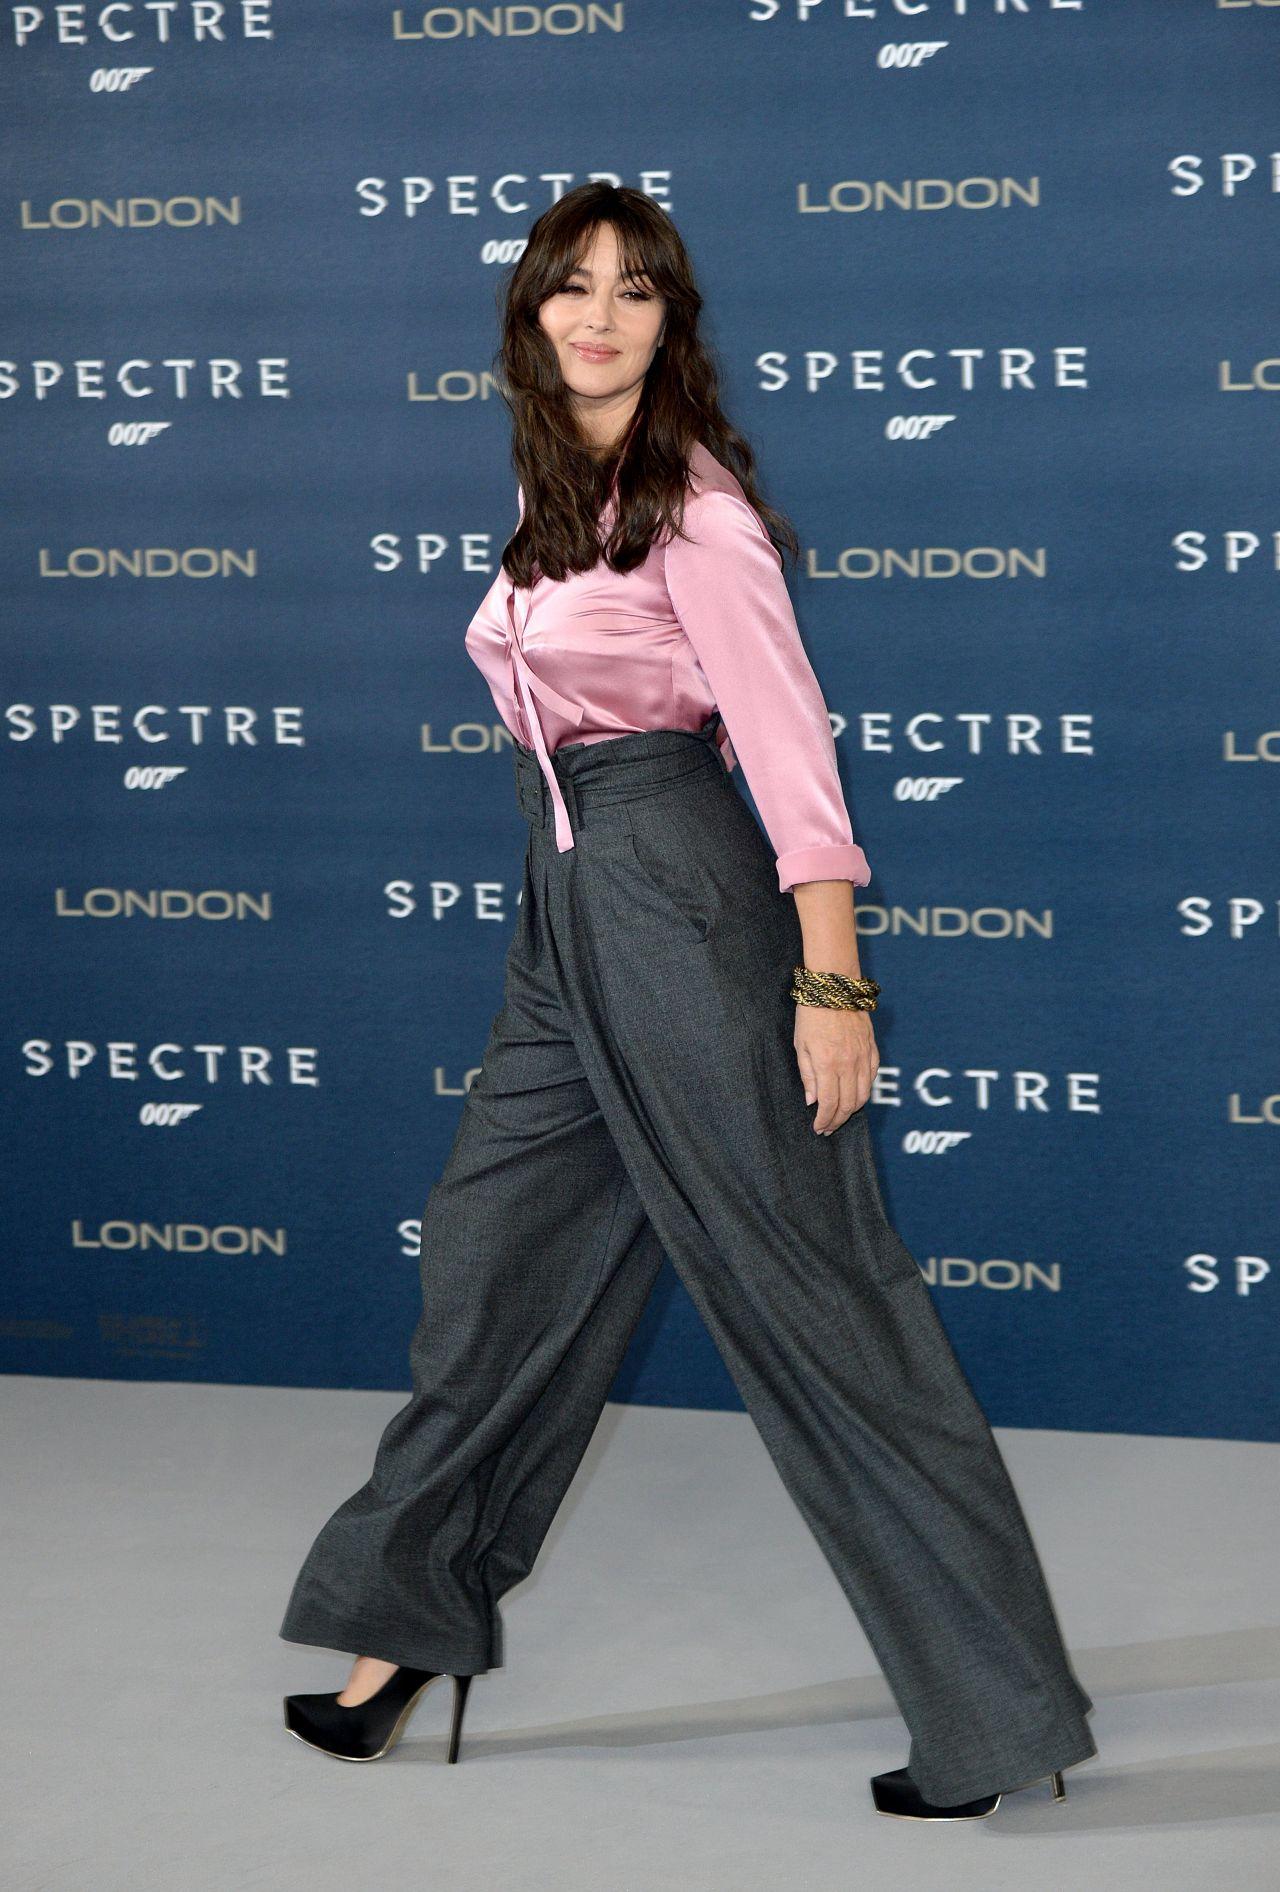 Monica Bellucci  Bond Spectre Photocall at Corinthia Hotel in London